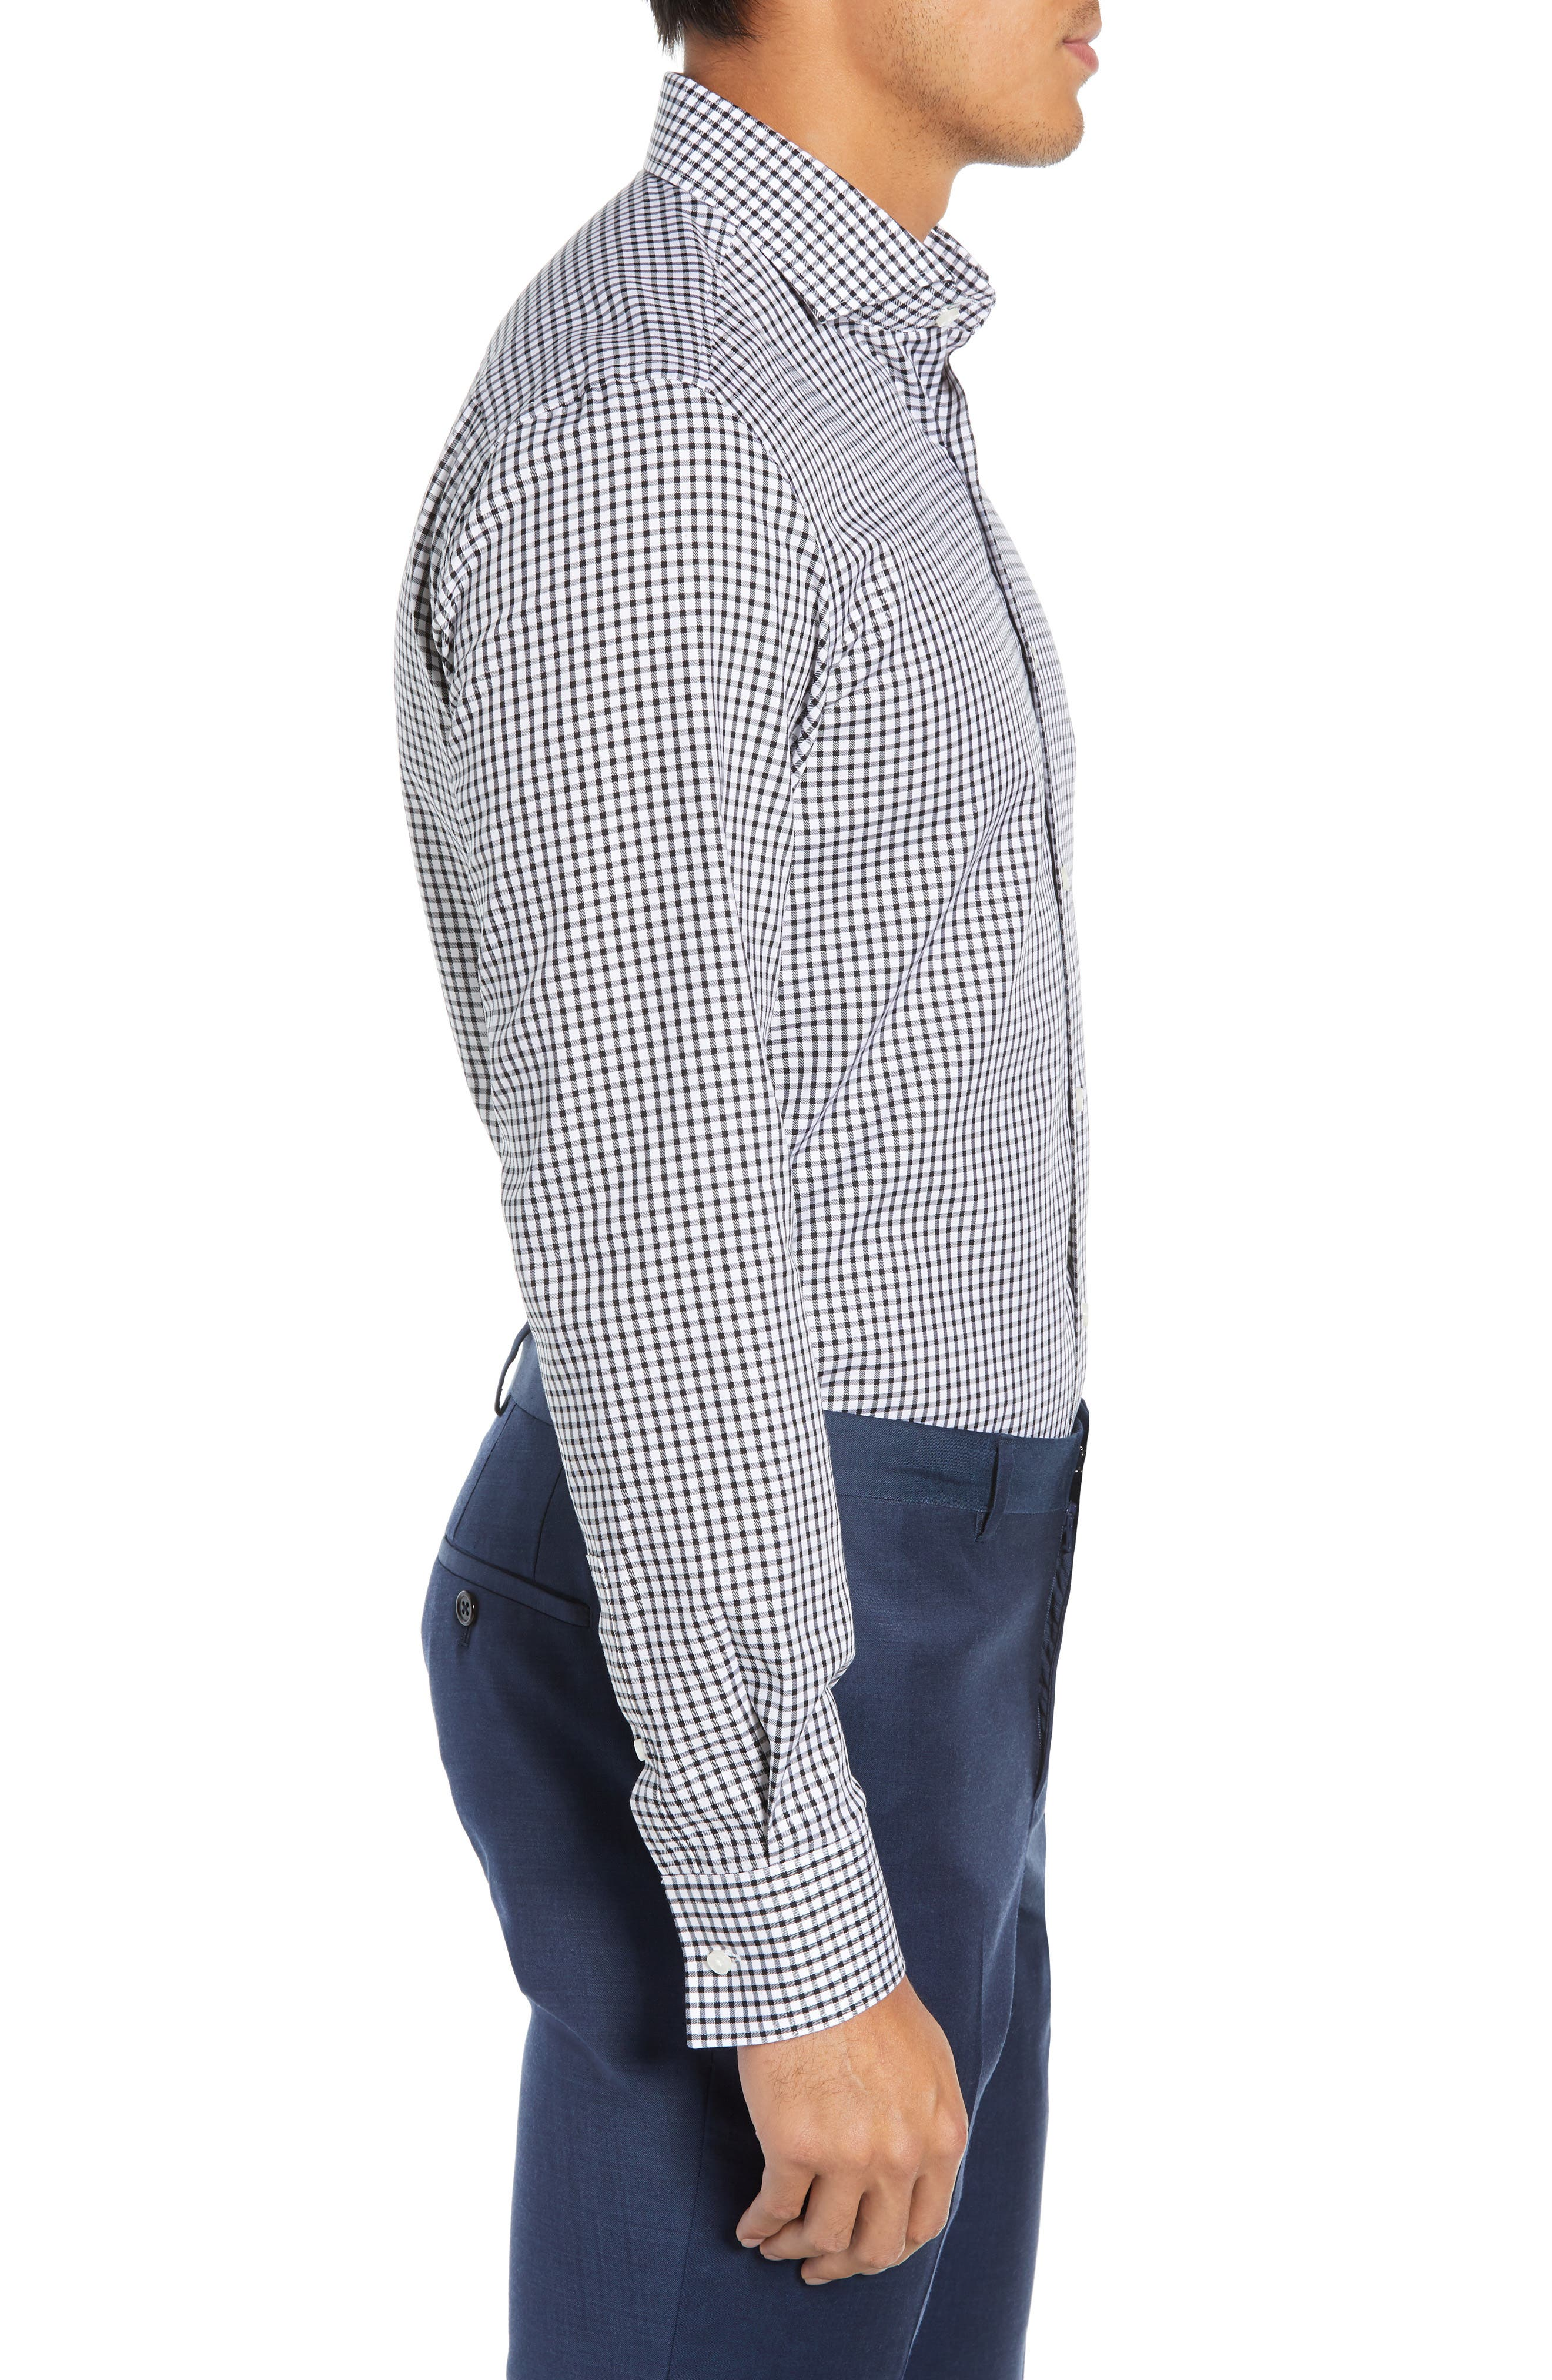 Jason Trim Fit Check Dress Shirt,                             Alternate thumbnail 4, color,                             002